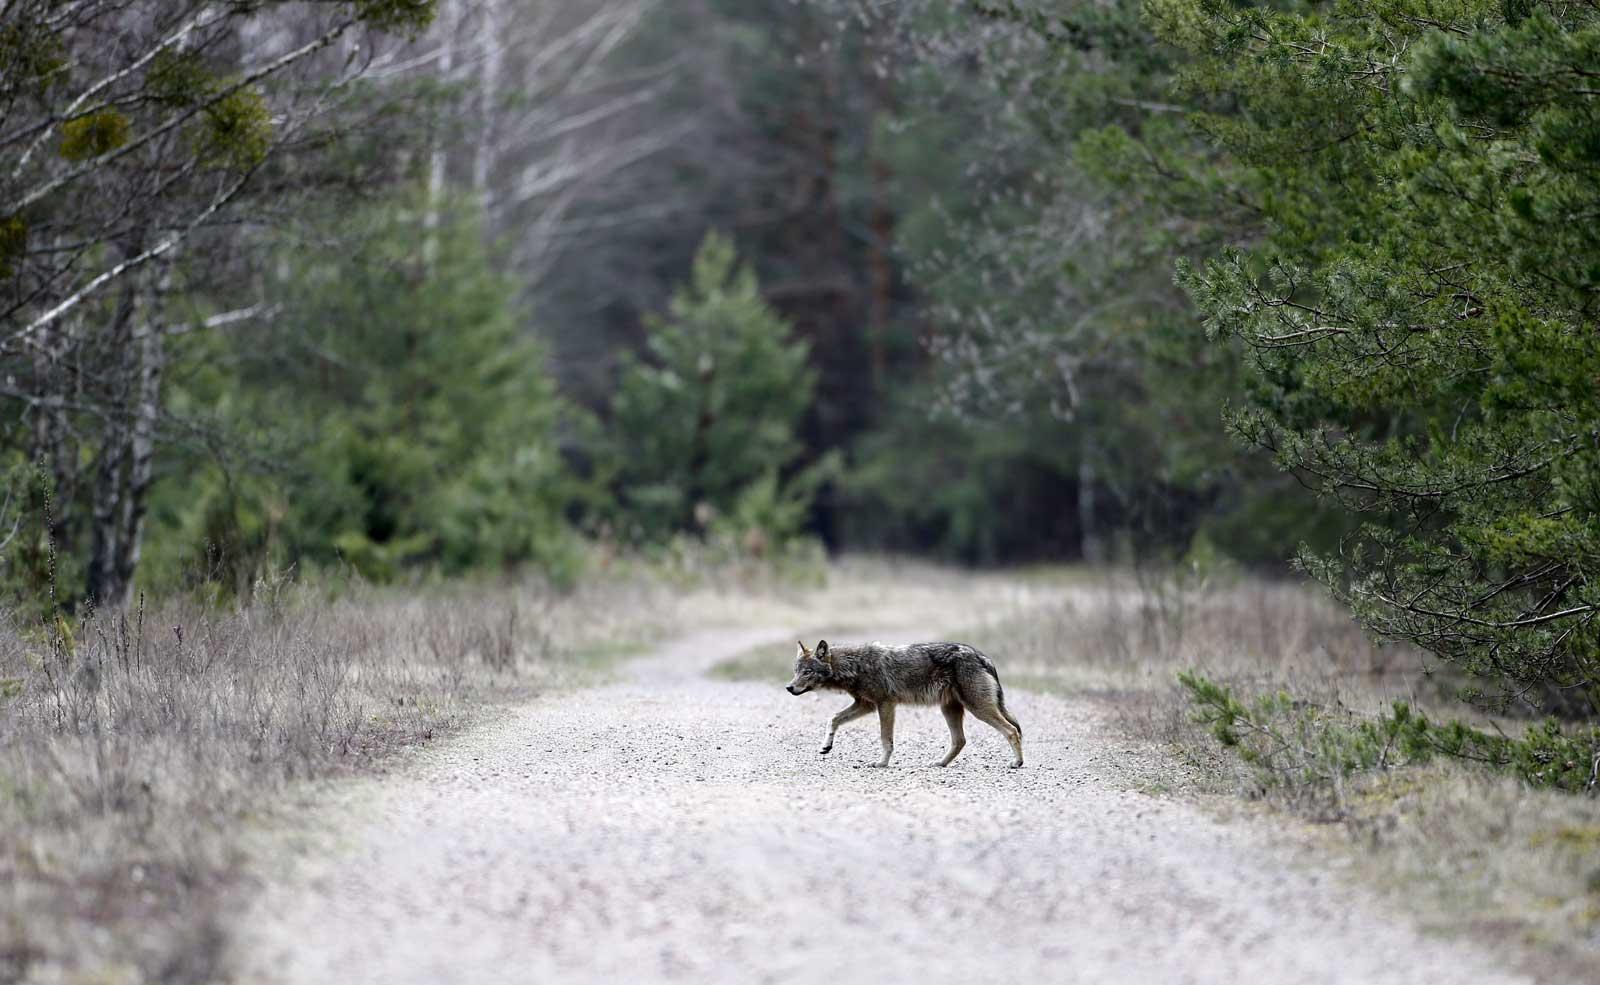 Nature has taken over Chernobyl